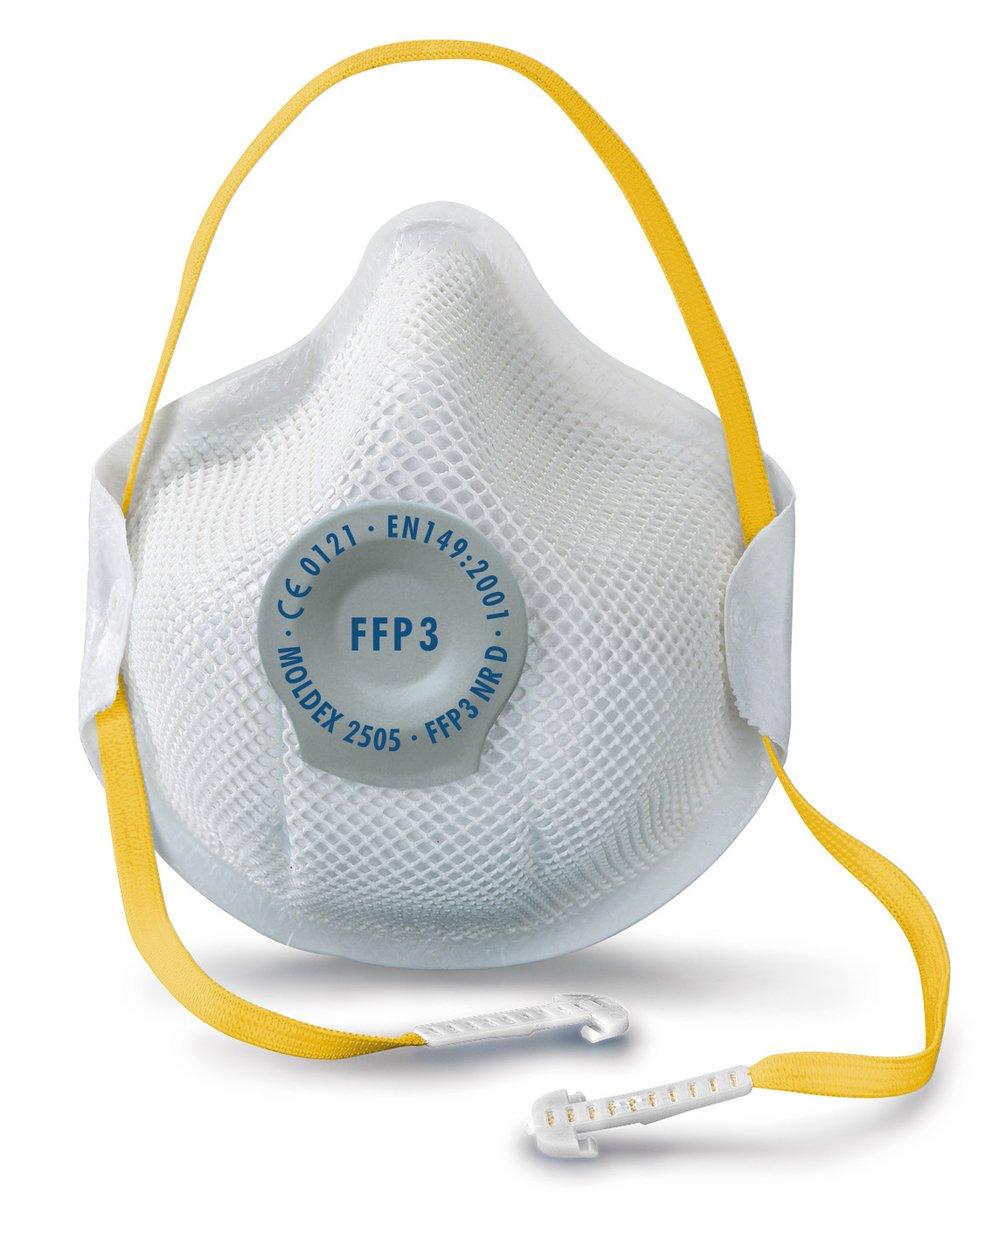 Moldex Saf6418/2505/Smart FFP3/Valve respiratoire lot de 10